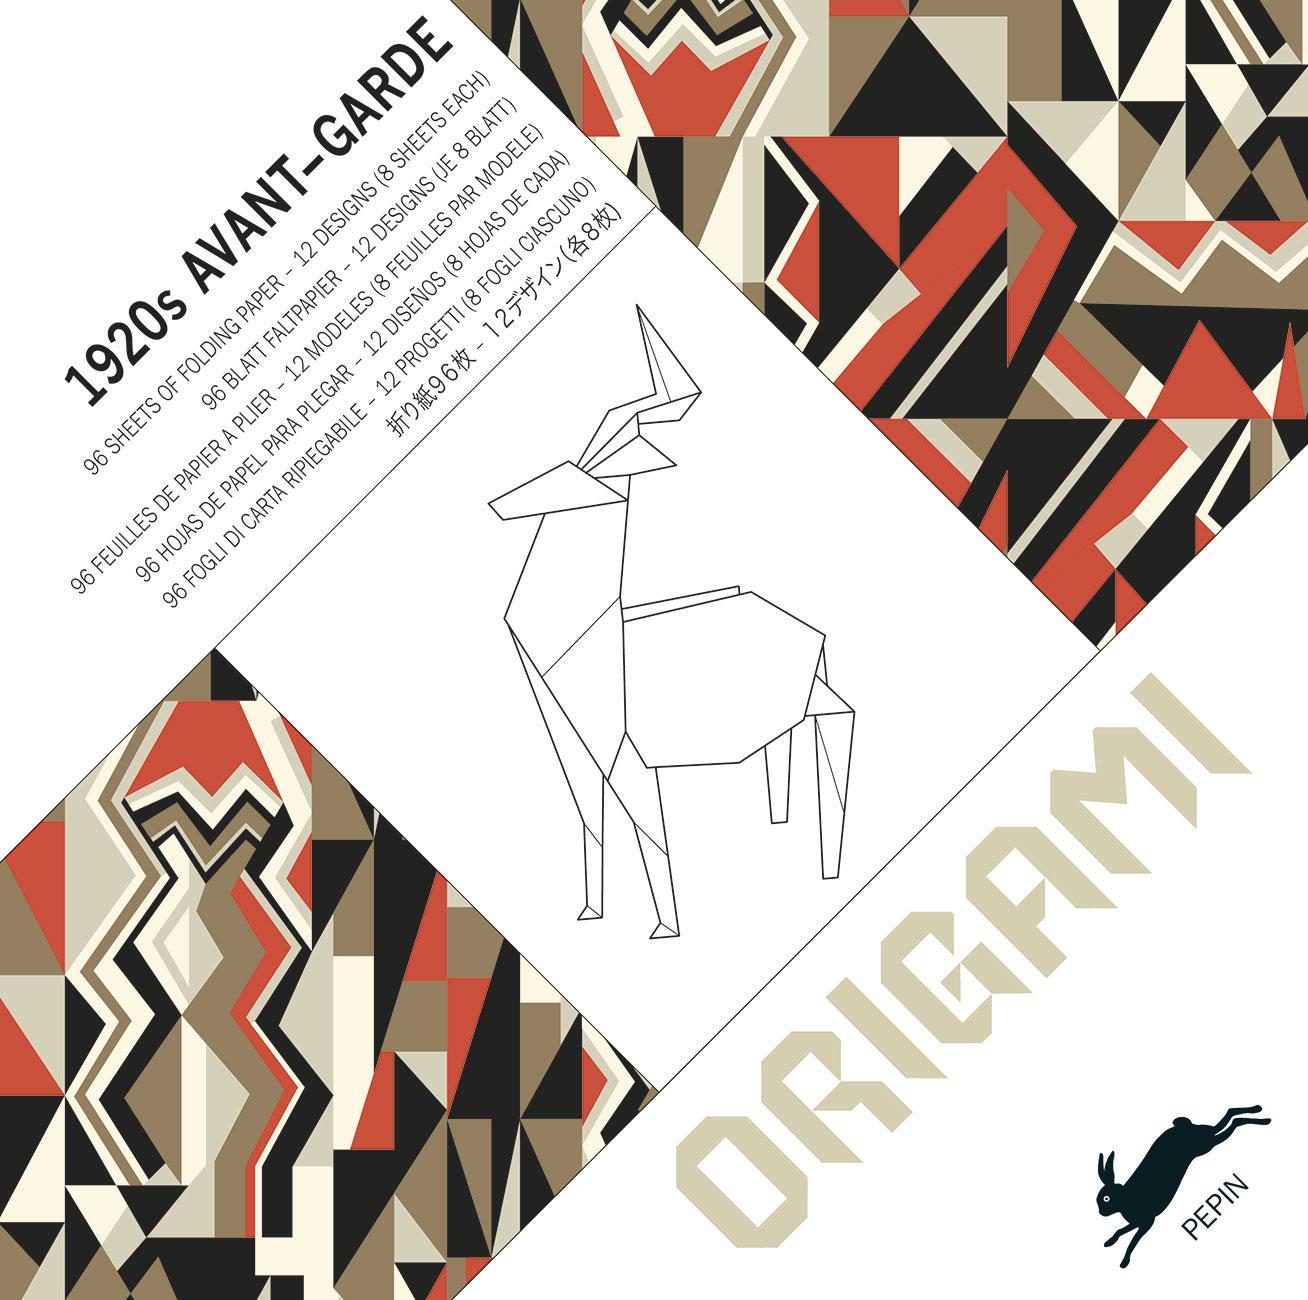 Origami Buch, 1920 Avantgarde